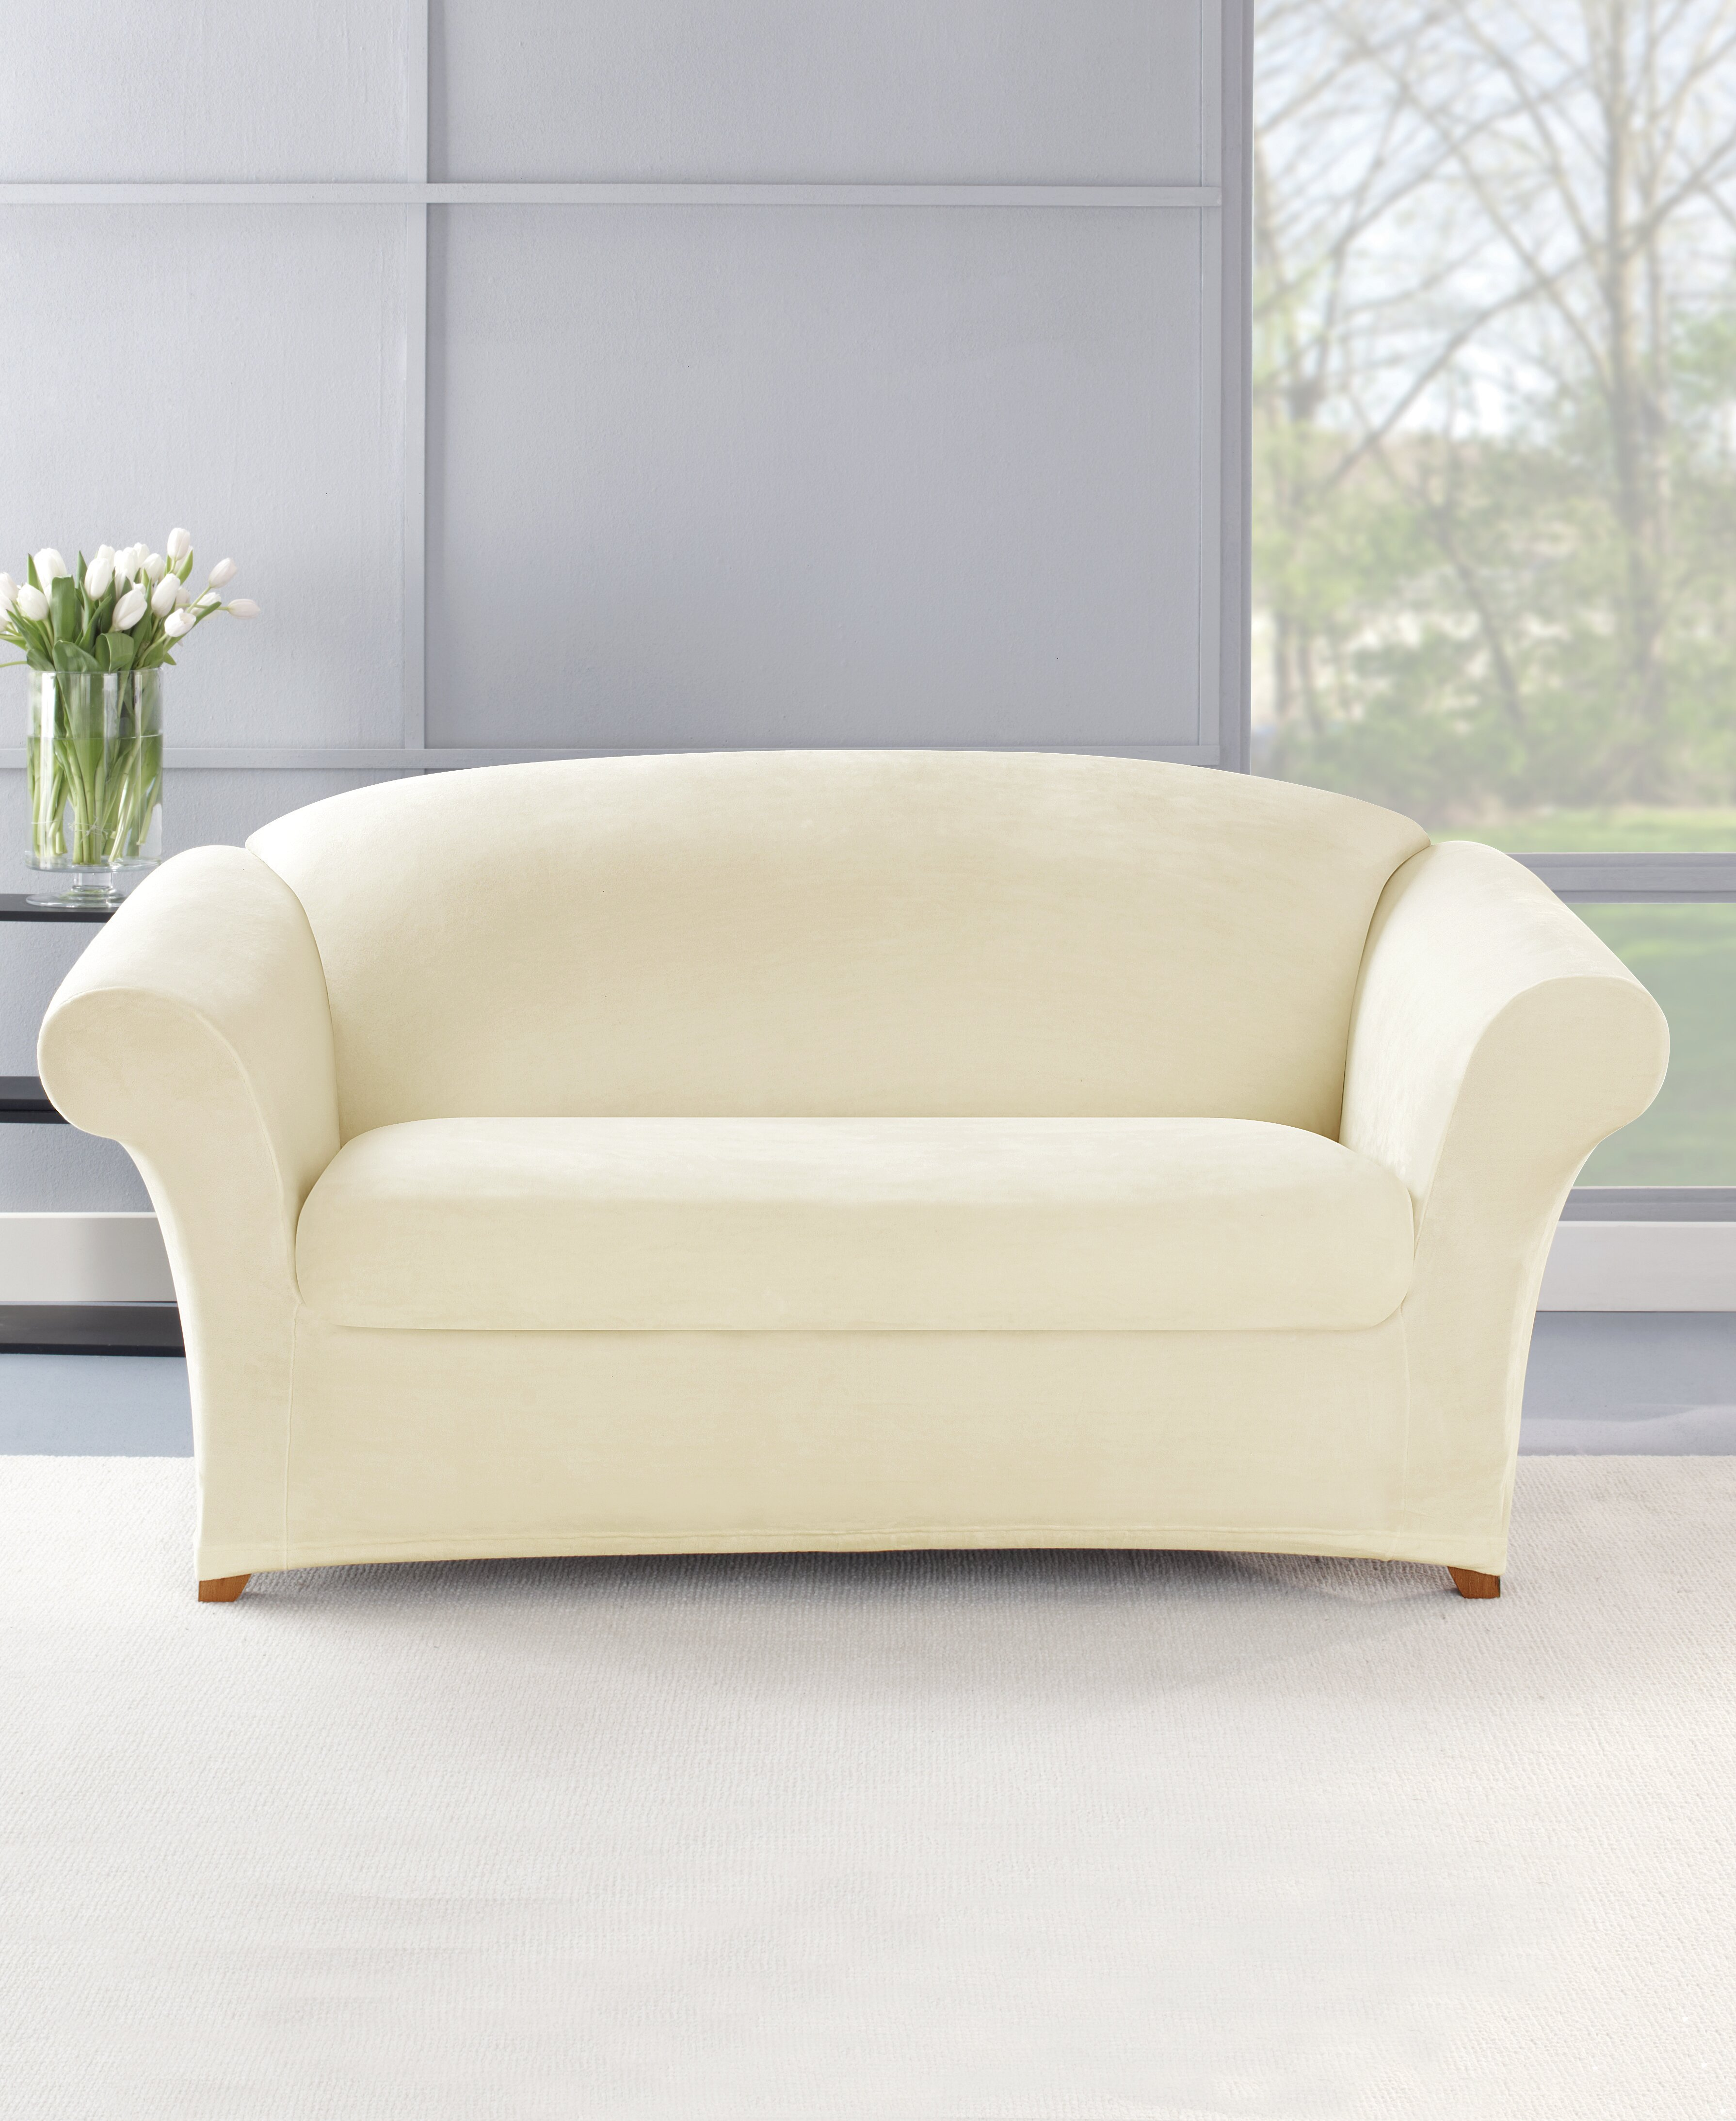 Swell Stretch Plush 2 Piece Loveseat Slipcover Set Unemploymentrelief Wooden Chair Designs For Living Room Unemploymentrelieforg